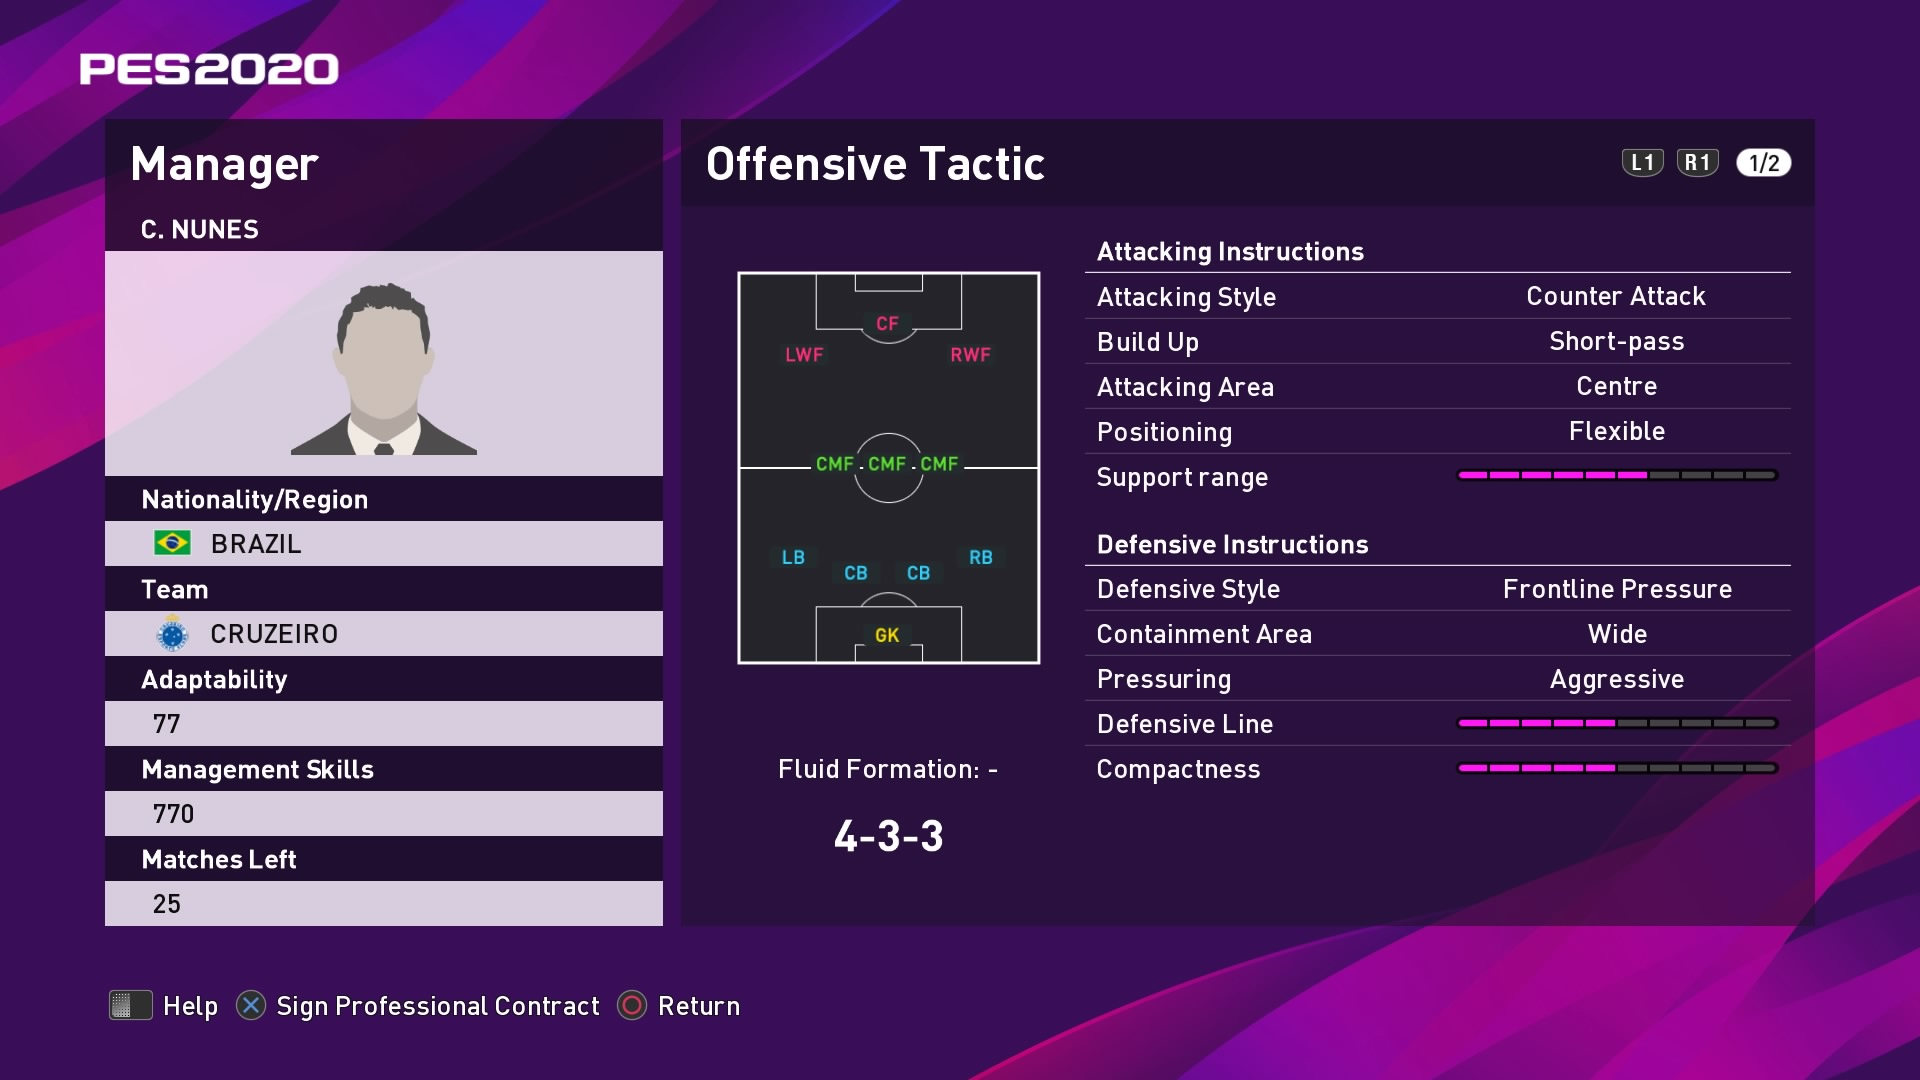 C. Nunes (Adilson Batista) Offensive Tactic in PES 2020 myClub